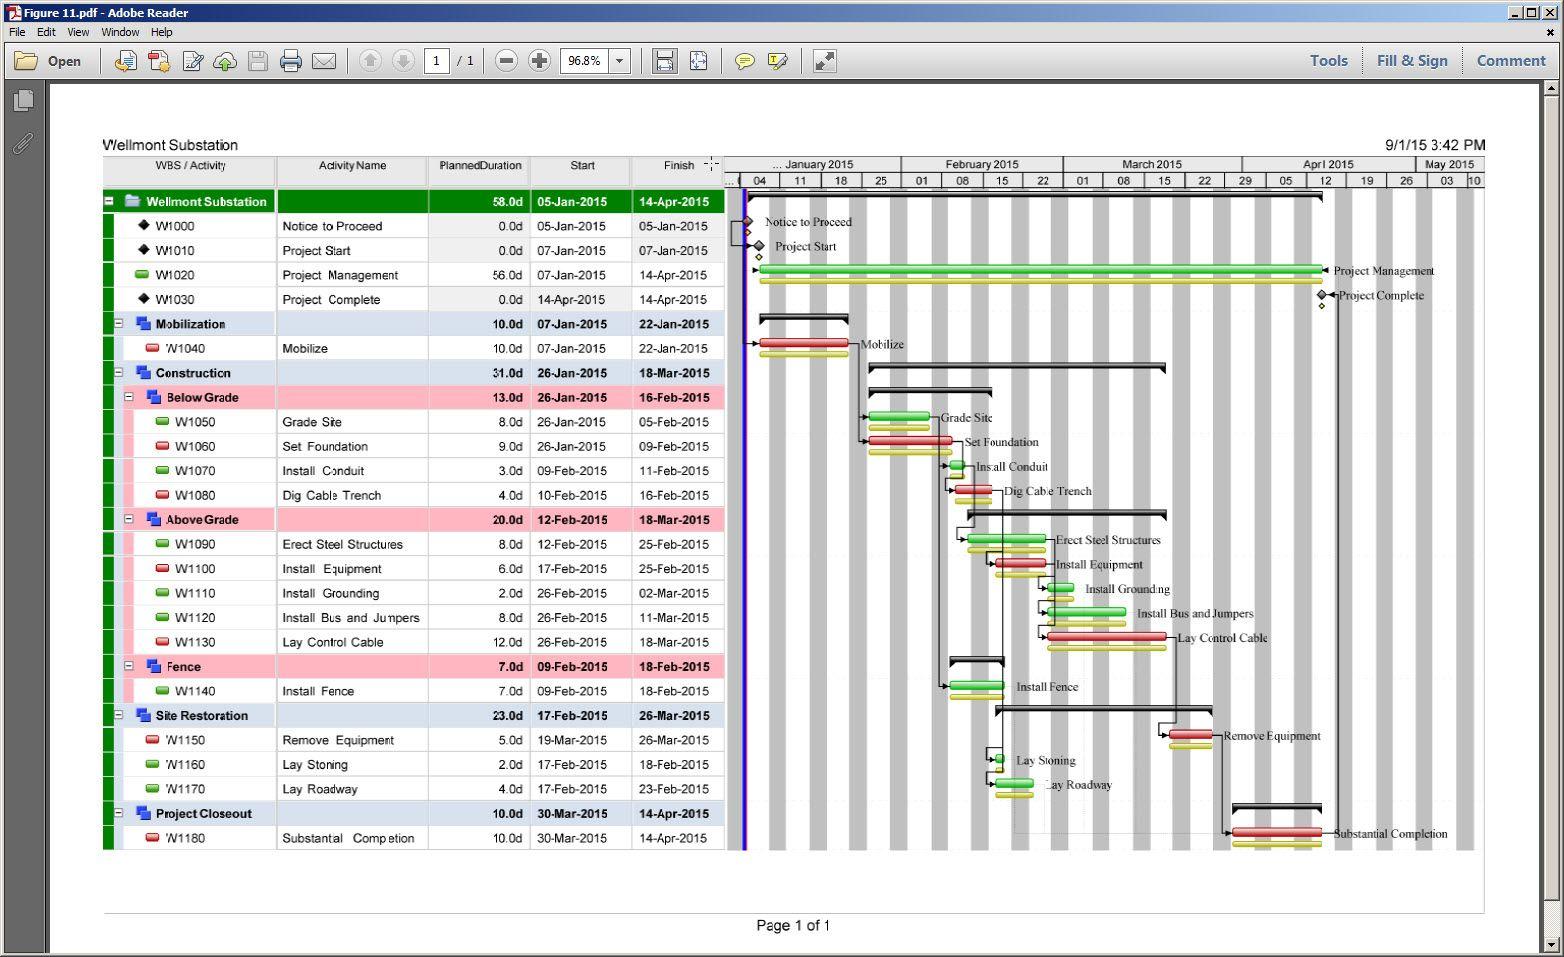 Microbiology Gram Positive Cocci Flow Chart Bacterial Identification Flow Charts And Schemes Flowchart For Gram Positive Cocci Bacteria In 2020 Gantt Chart Chart Gantt